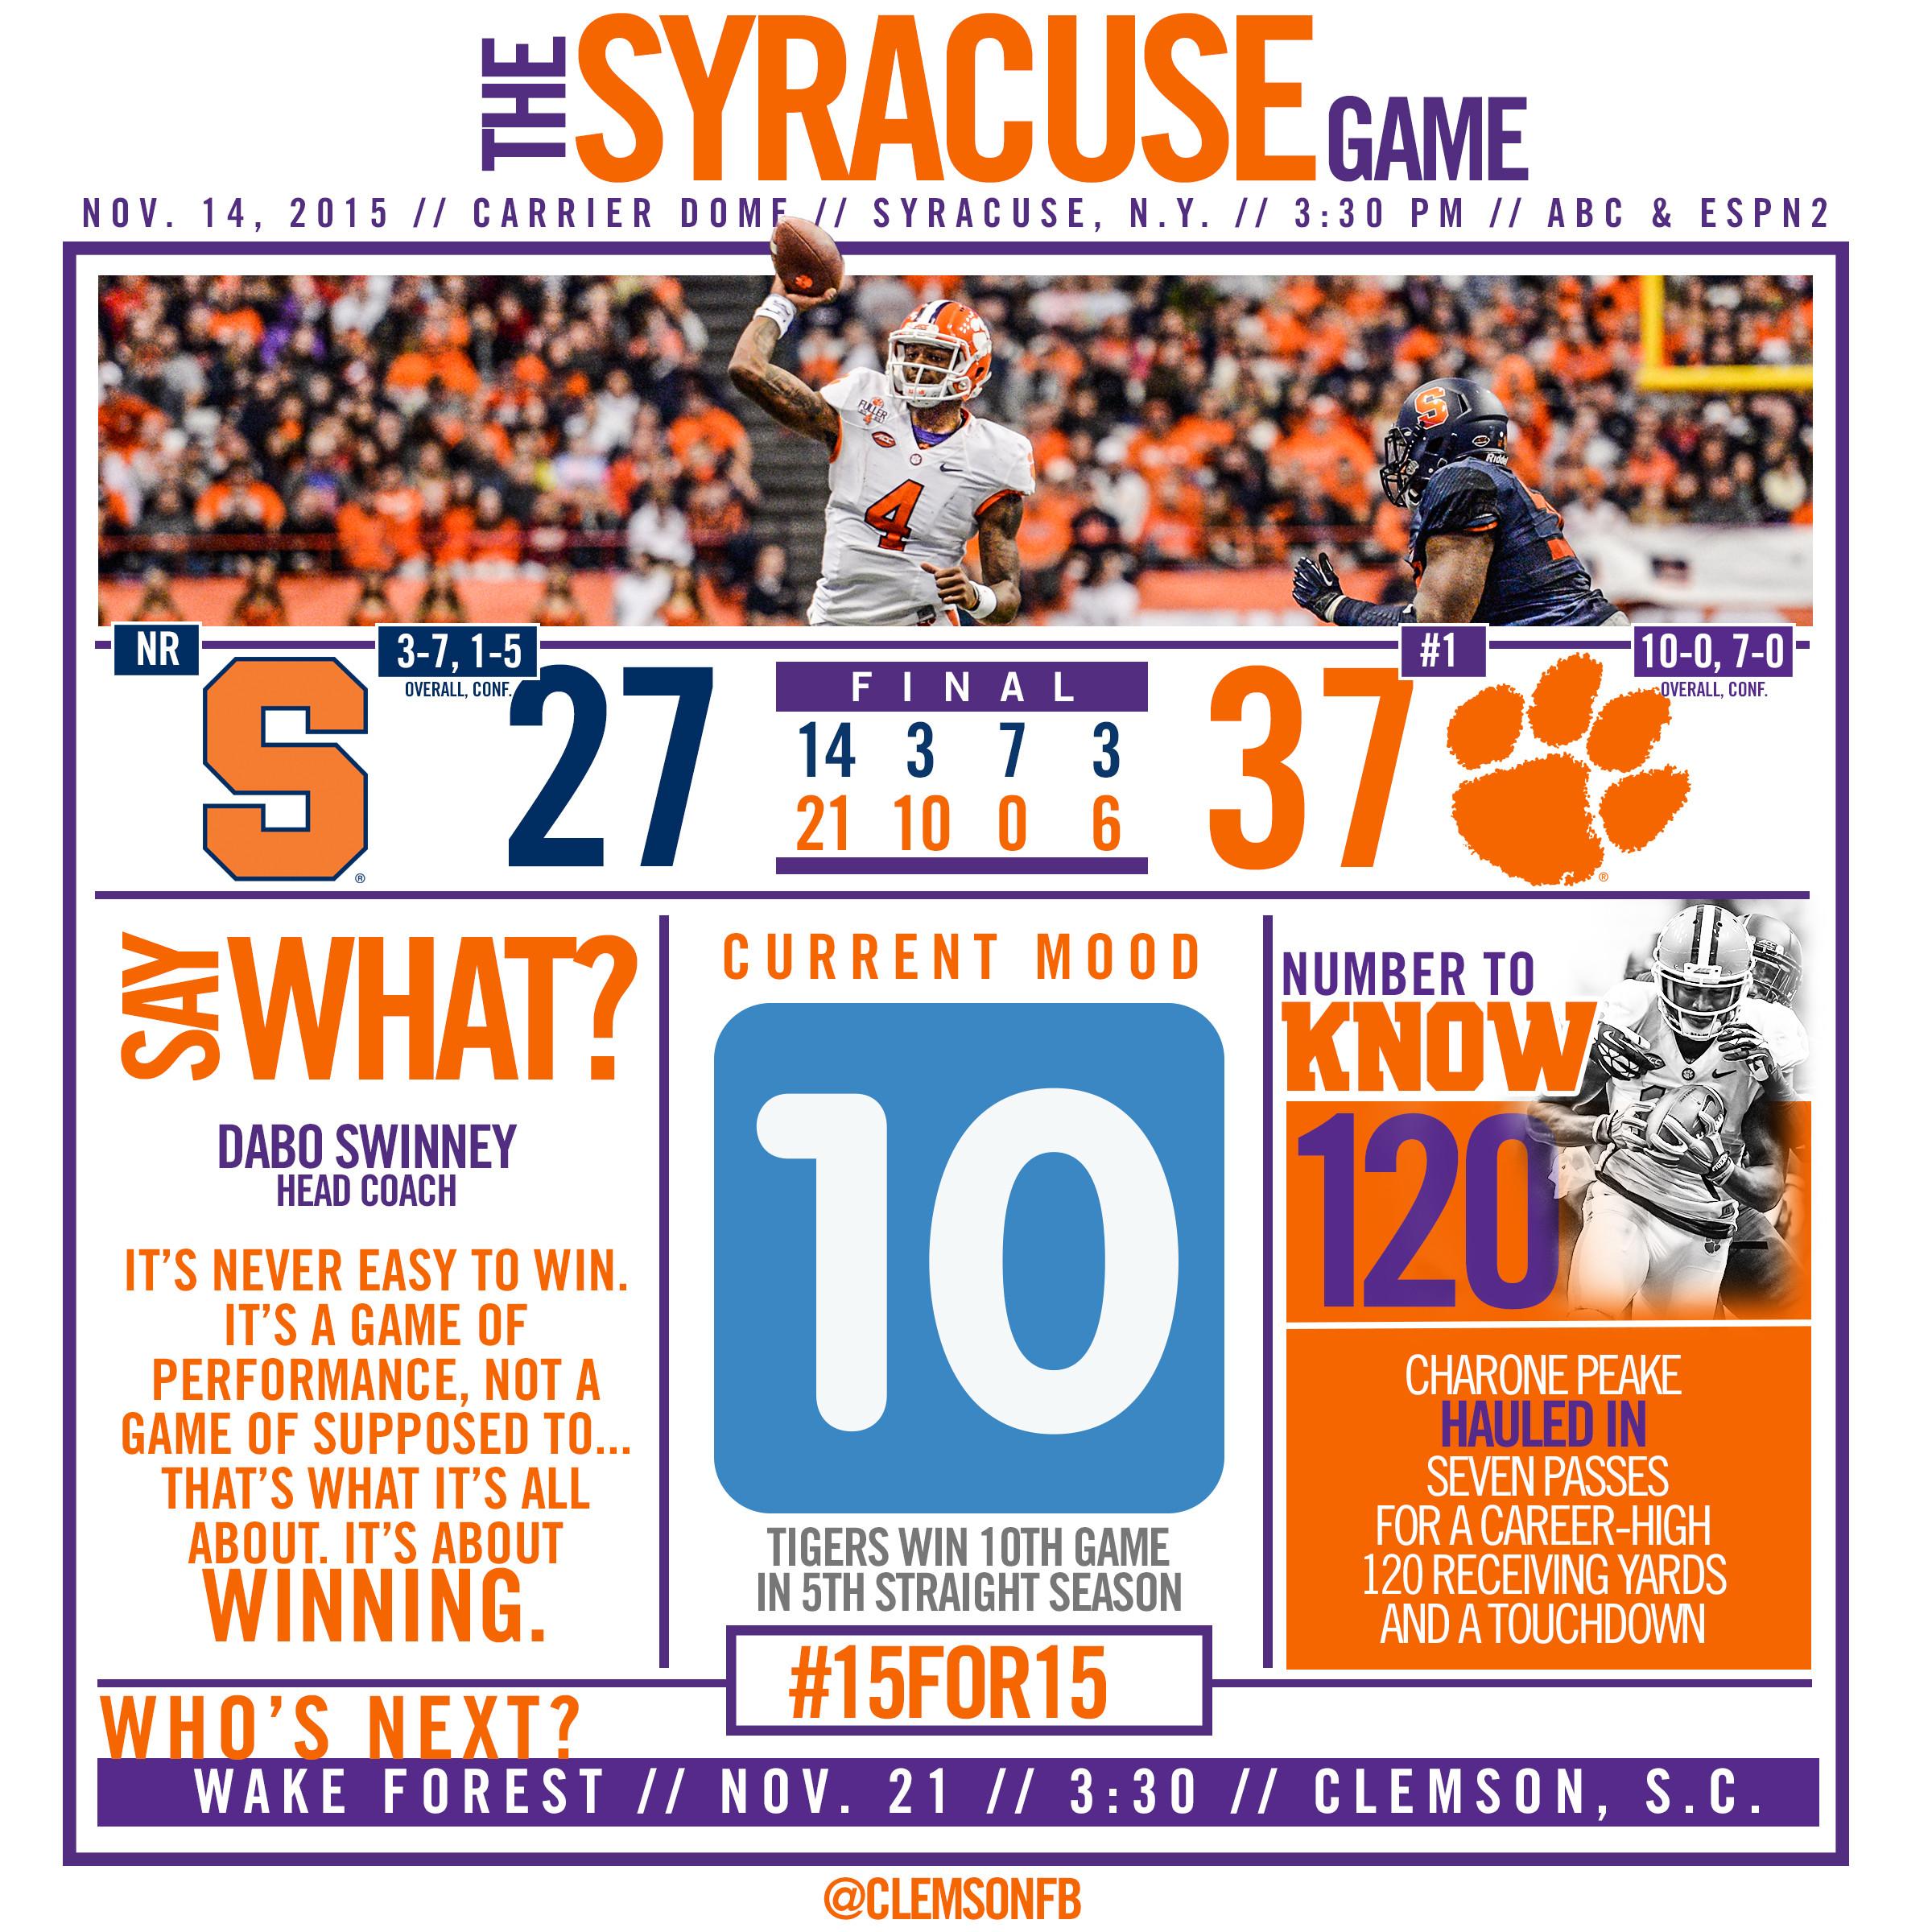 No. 1 Tigers Remain Perfect, Beat Syracuse 37-27